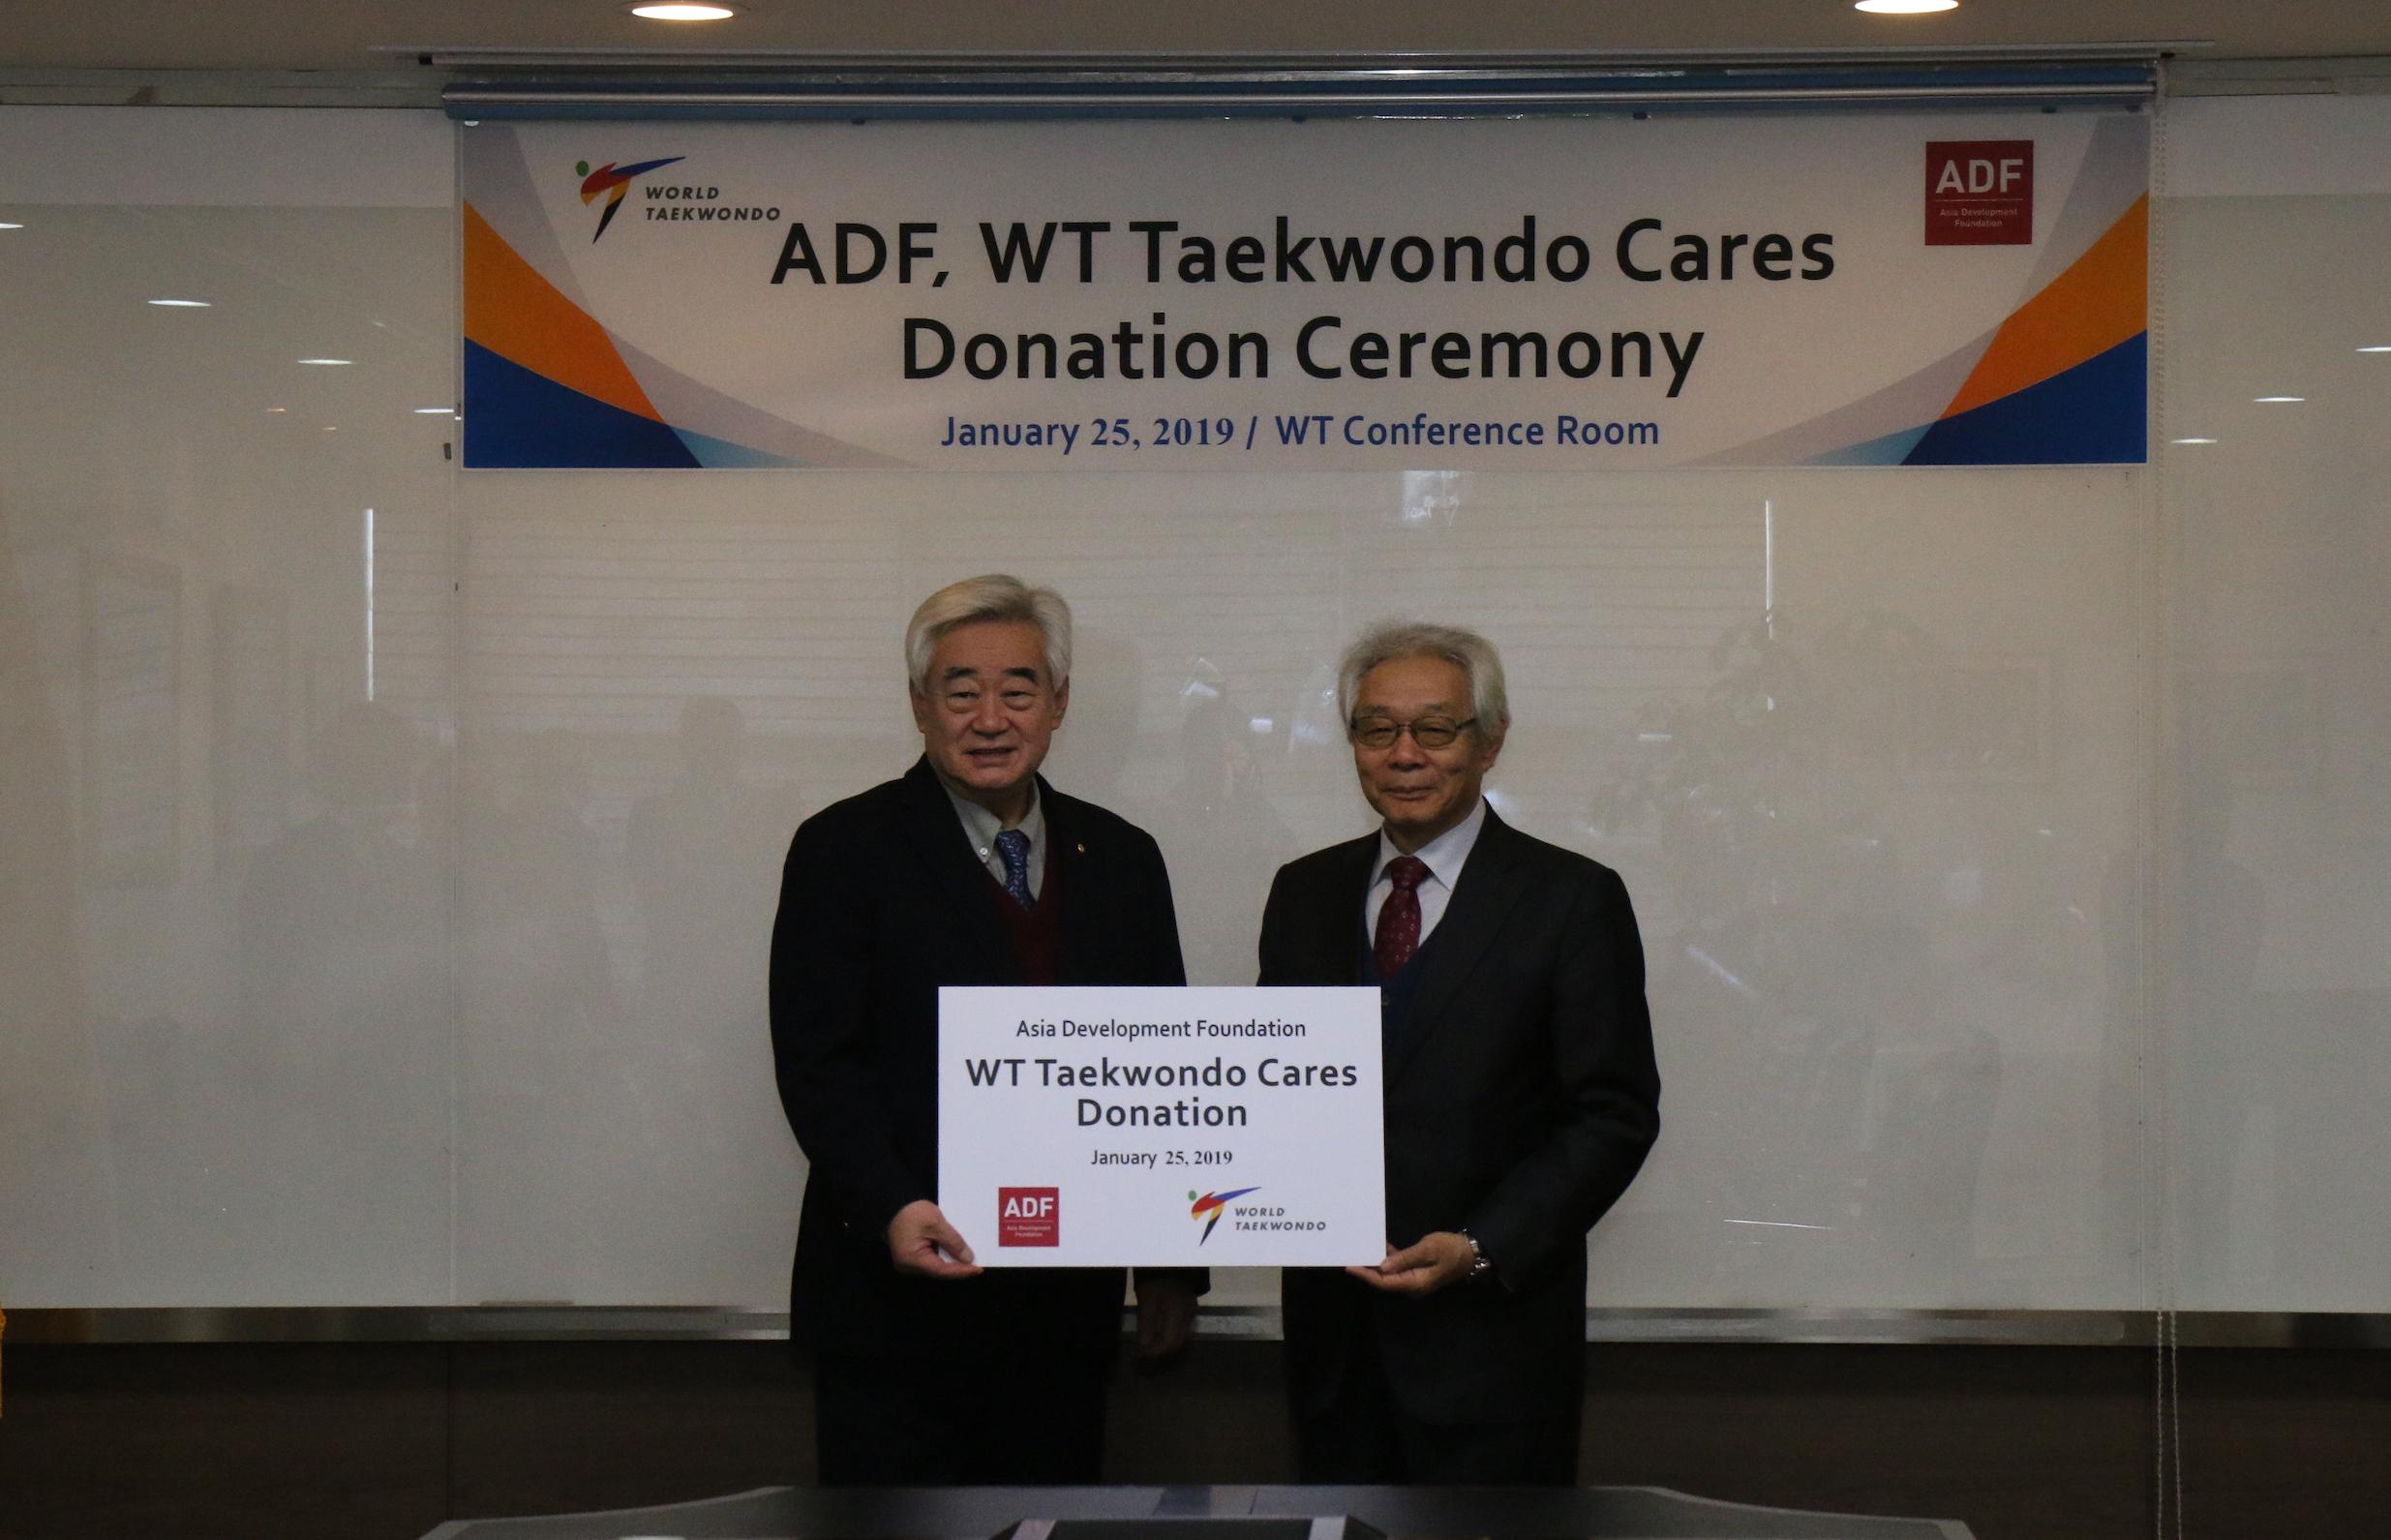 ADF Delivers WT $90,000 in Designated Donation